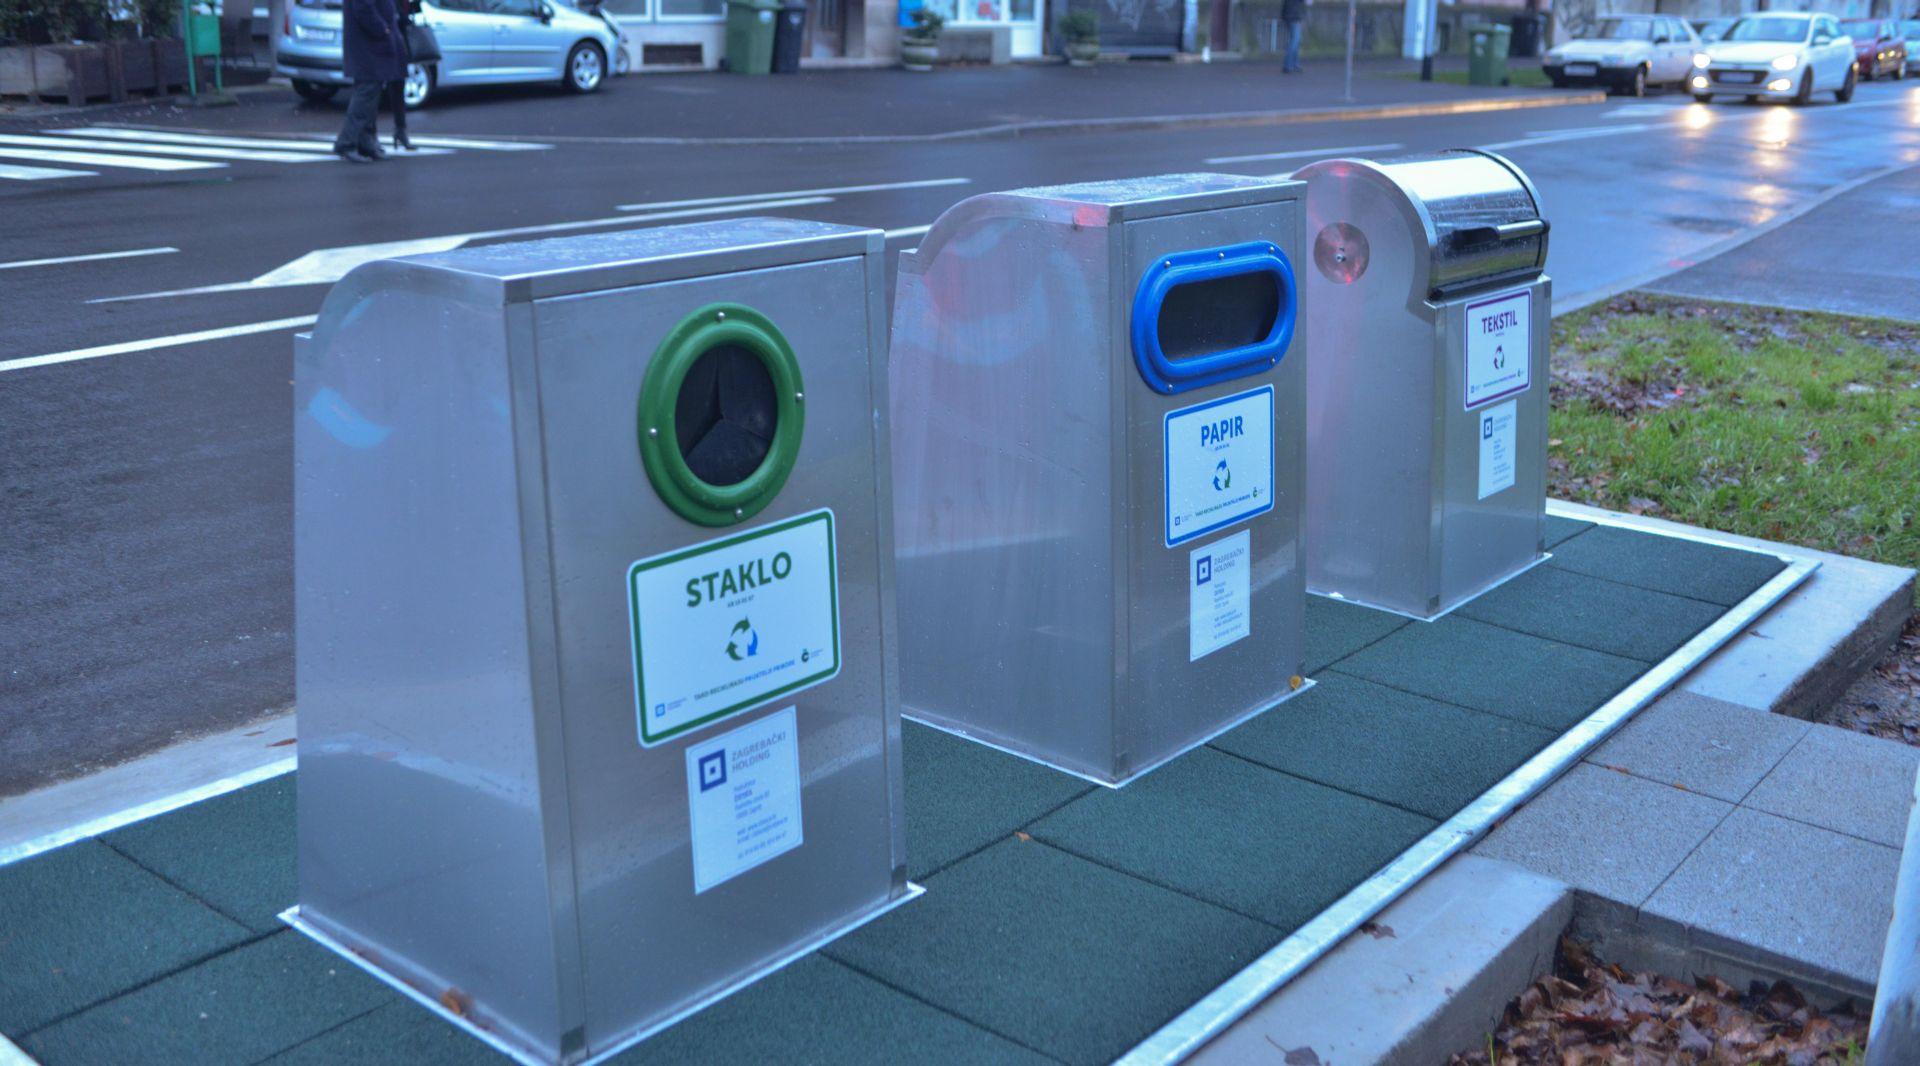 FOTO: Zagreb dobio podzemni spremnik za odvojeno skupljanje otpada